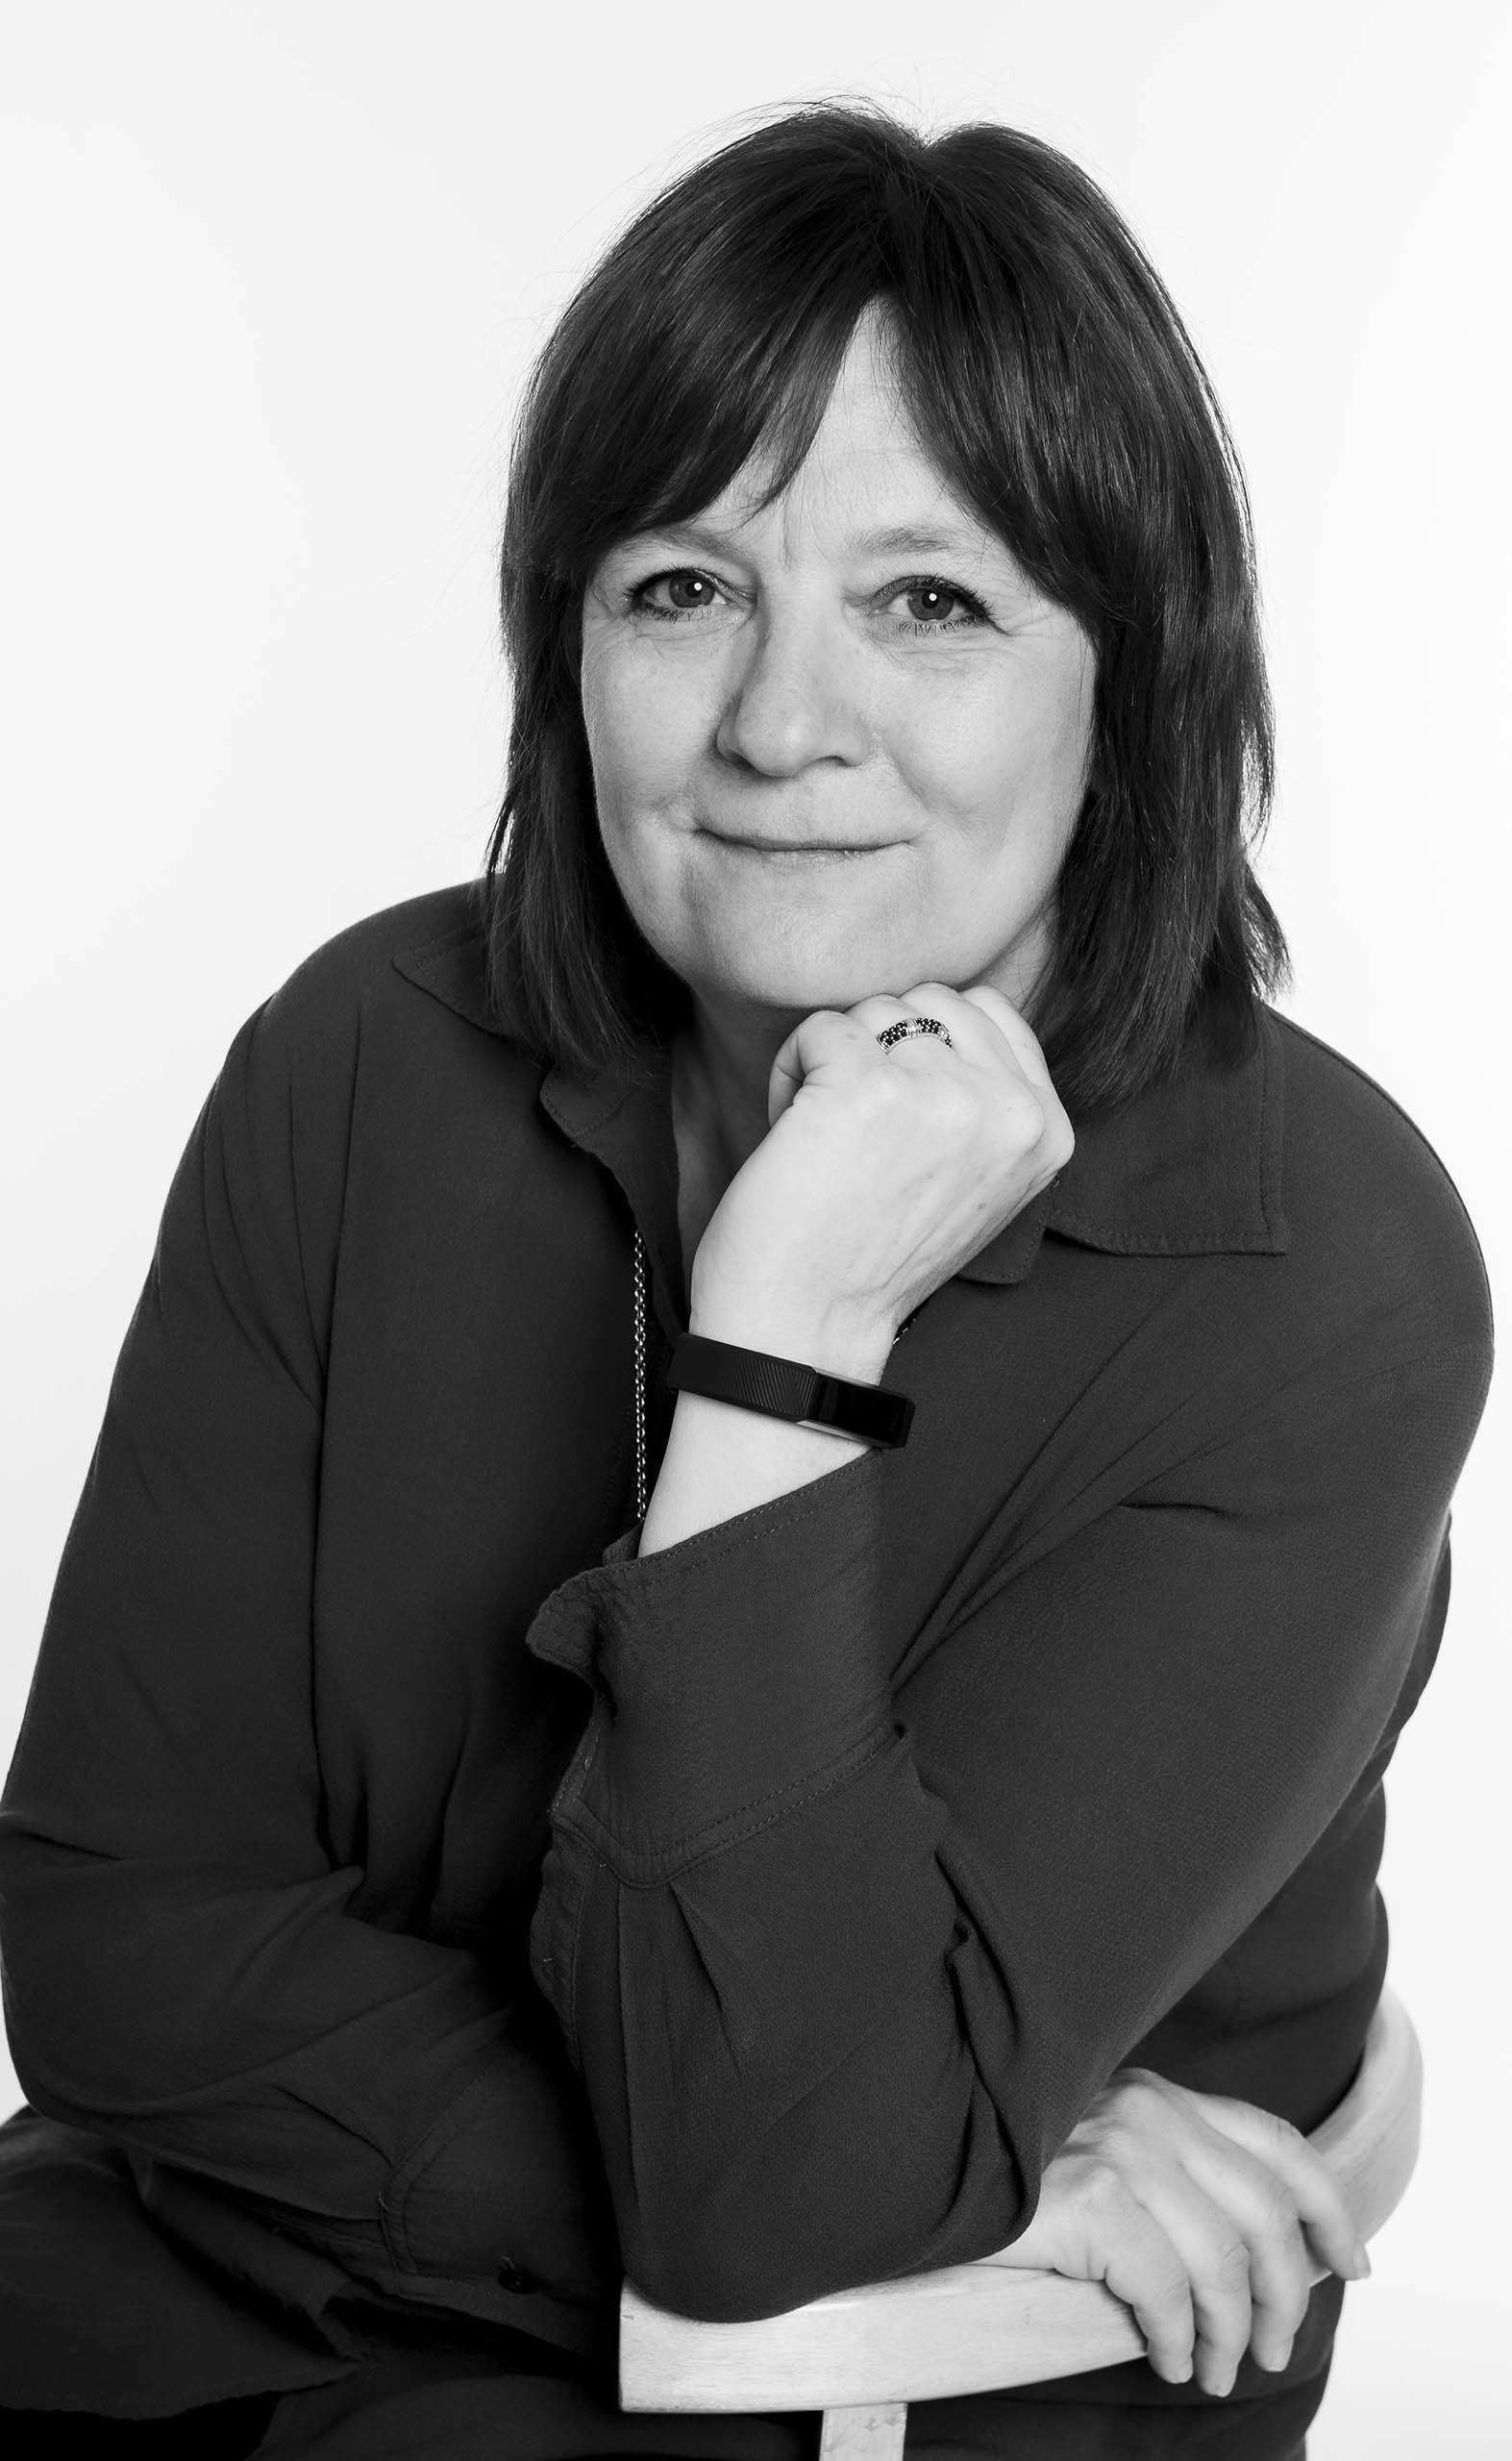 Helen Swanberg